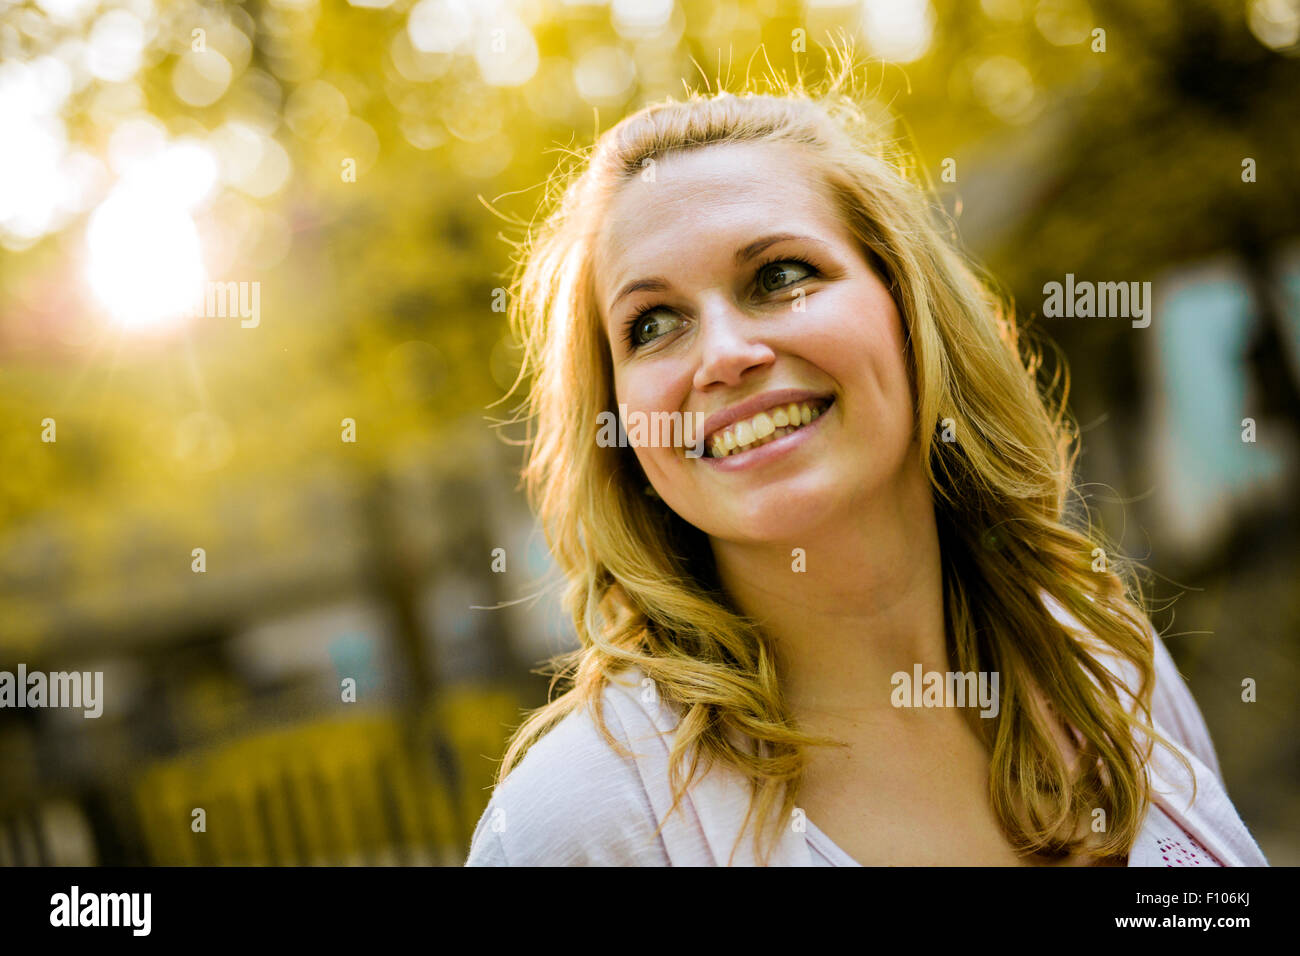 Belles jeunes femmes smiling Photo Stock